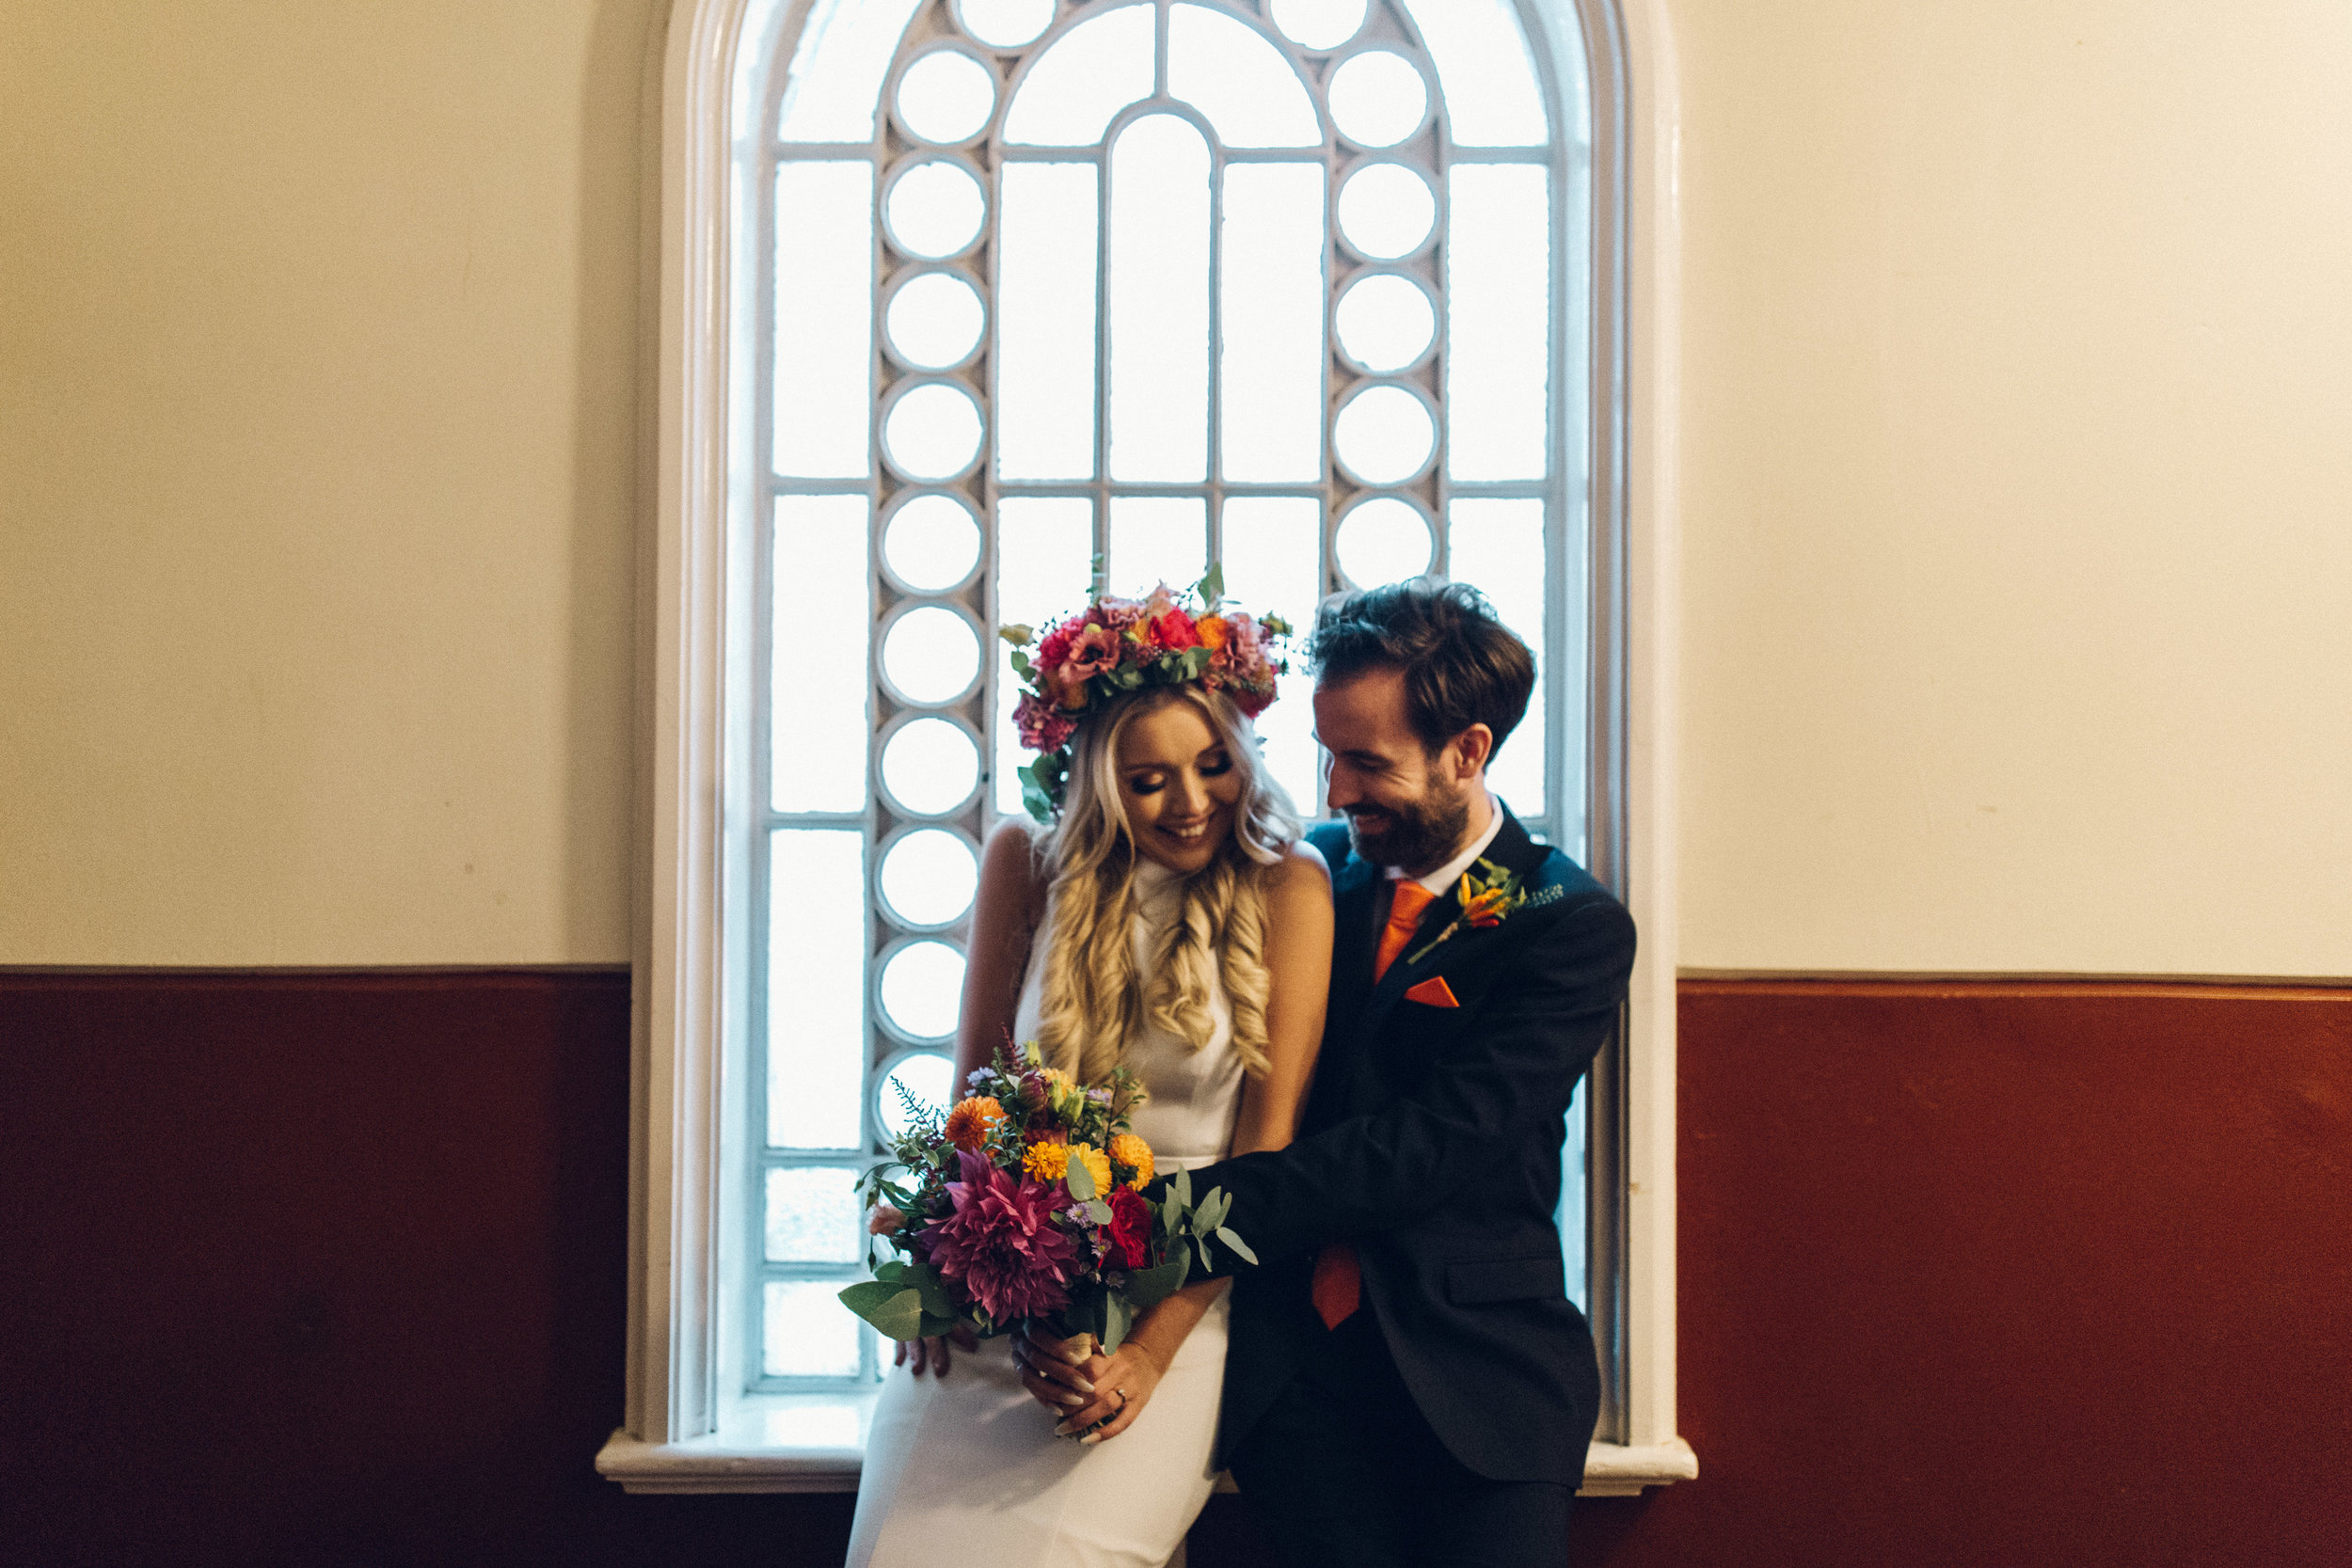 Rainy wedding day Hackney Round Chapel - Chloe Lee Photo Alternative wedding photography